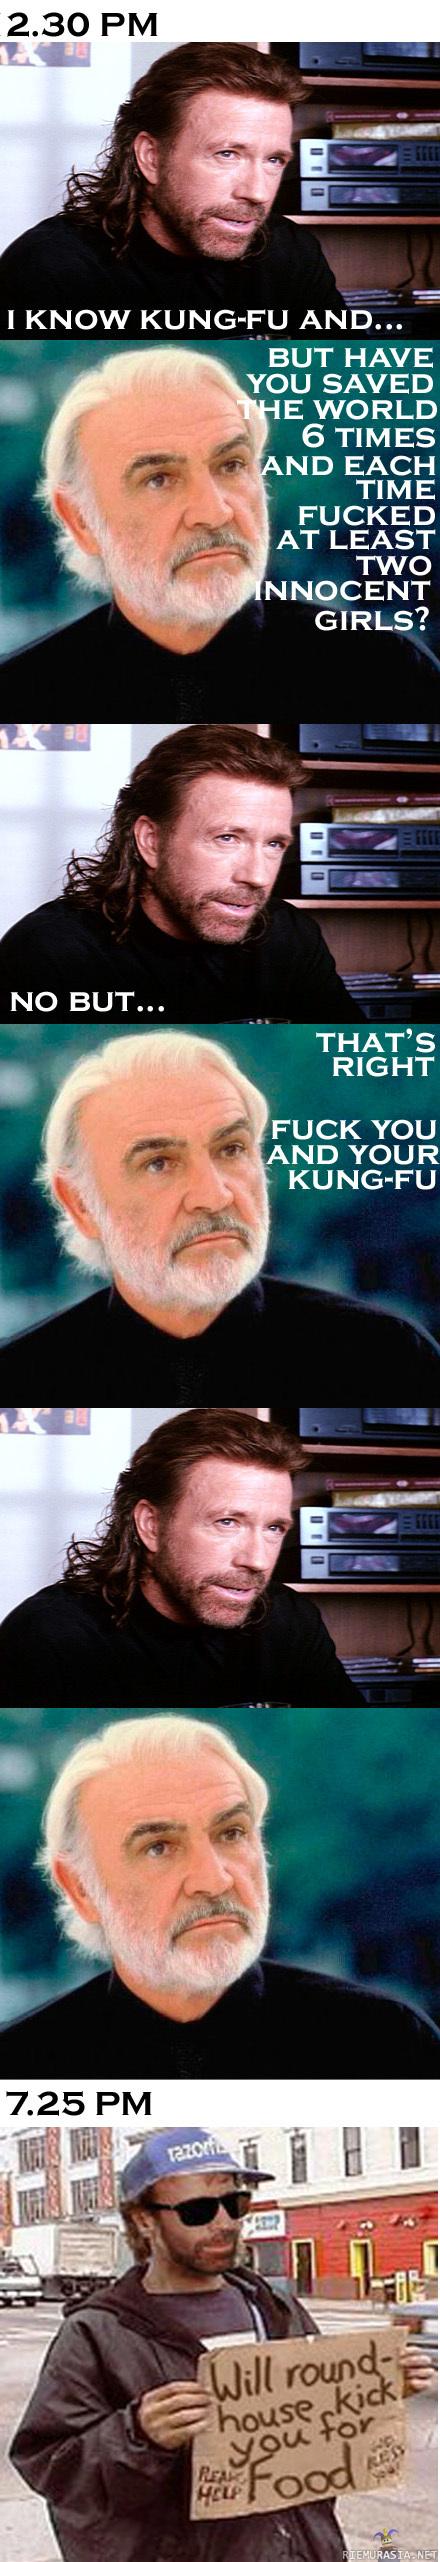 sean connery vs. chuck norris   Chuck norris, Sean connery ...